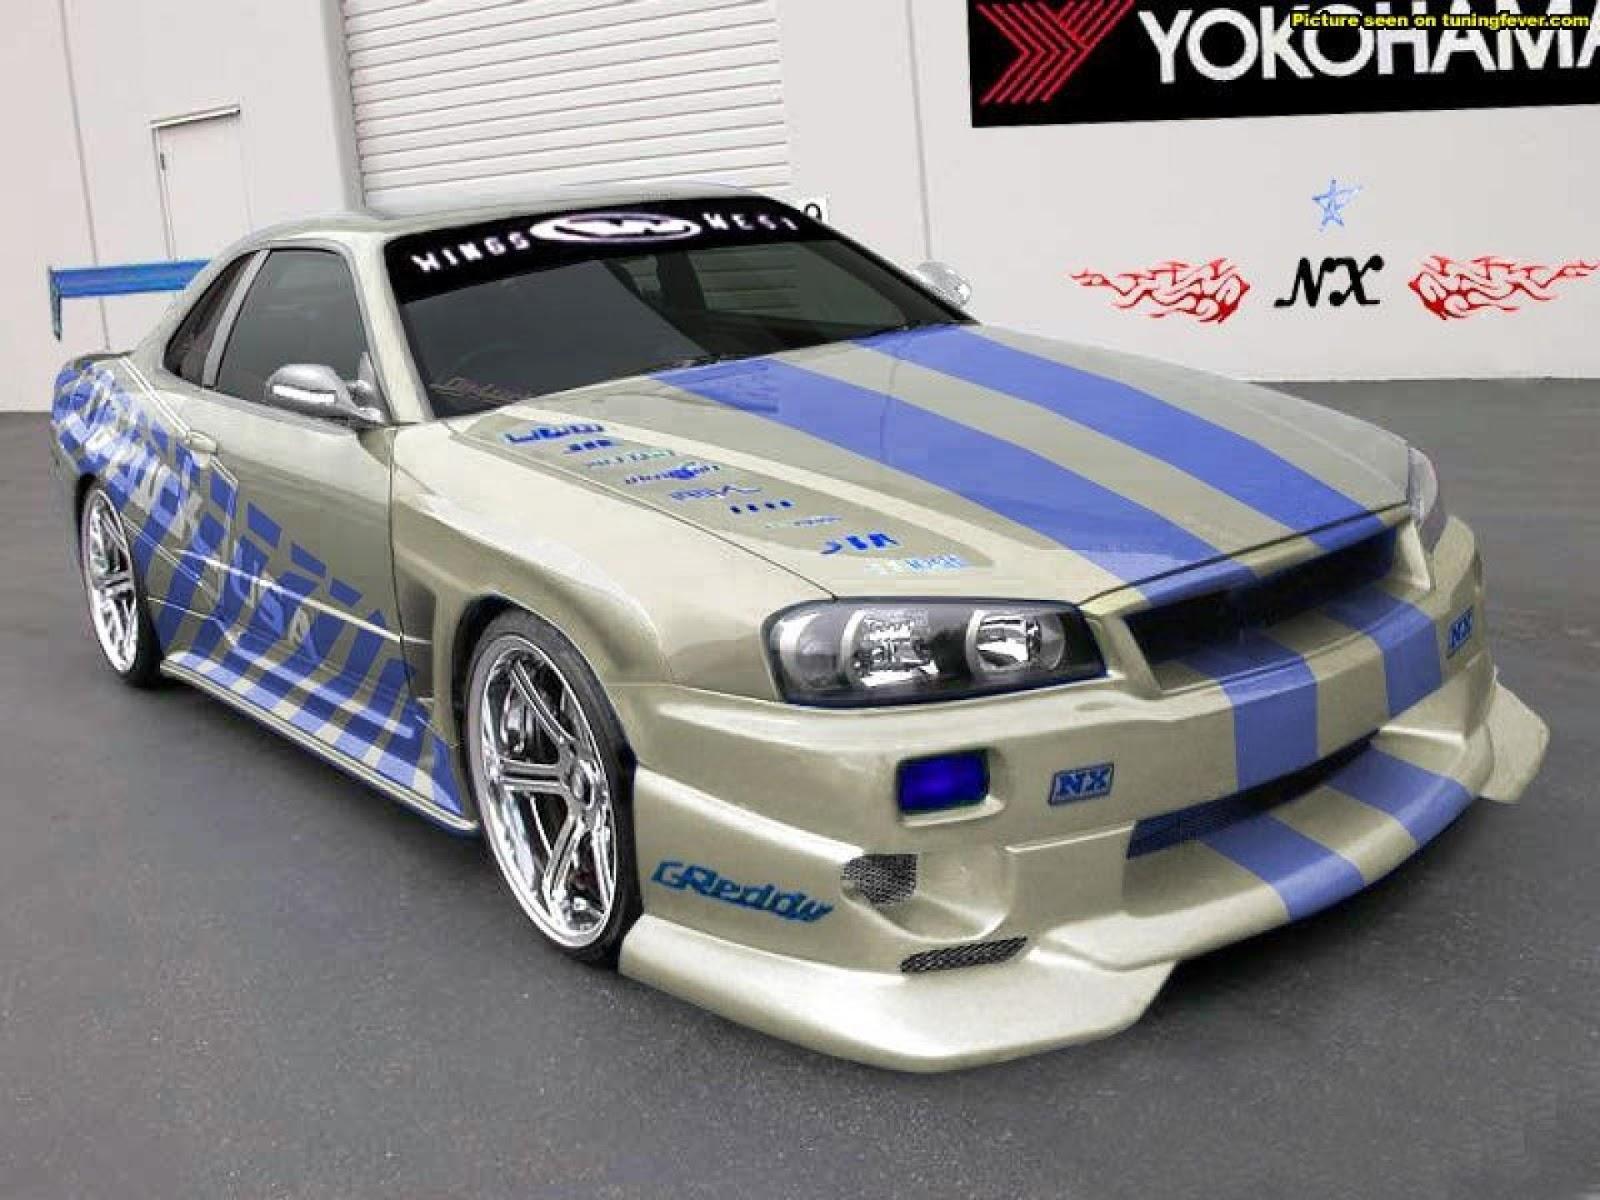 Fast 2 Furious Nissan Skyline Gtr | Car Interior Design